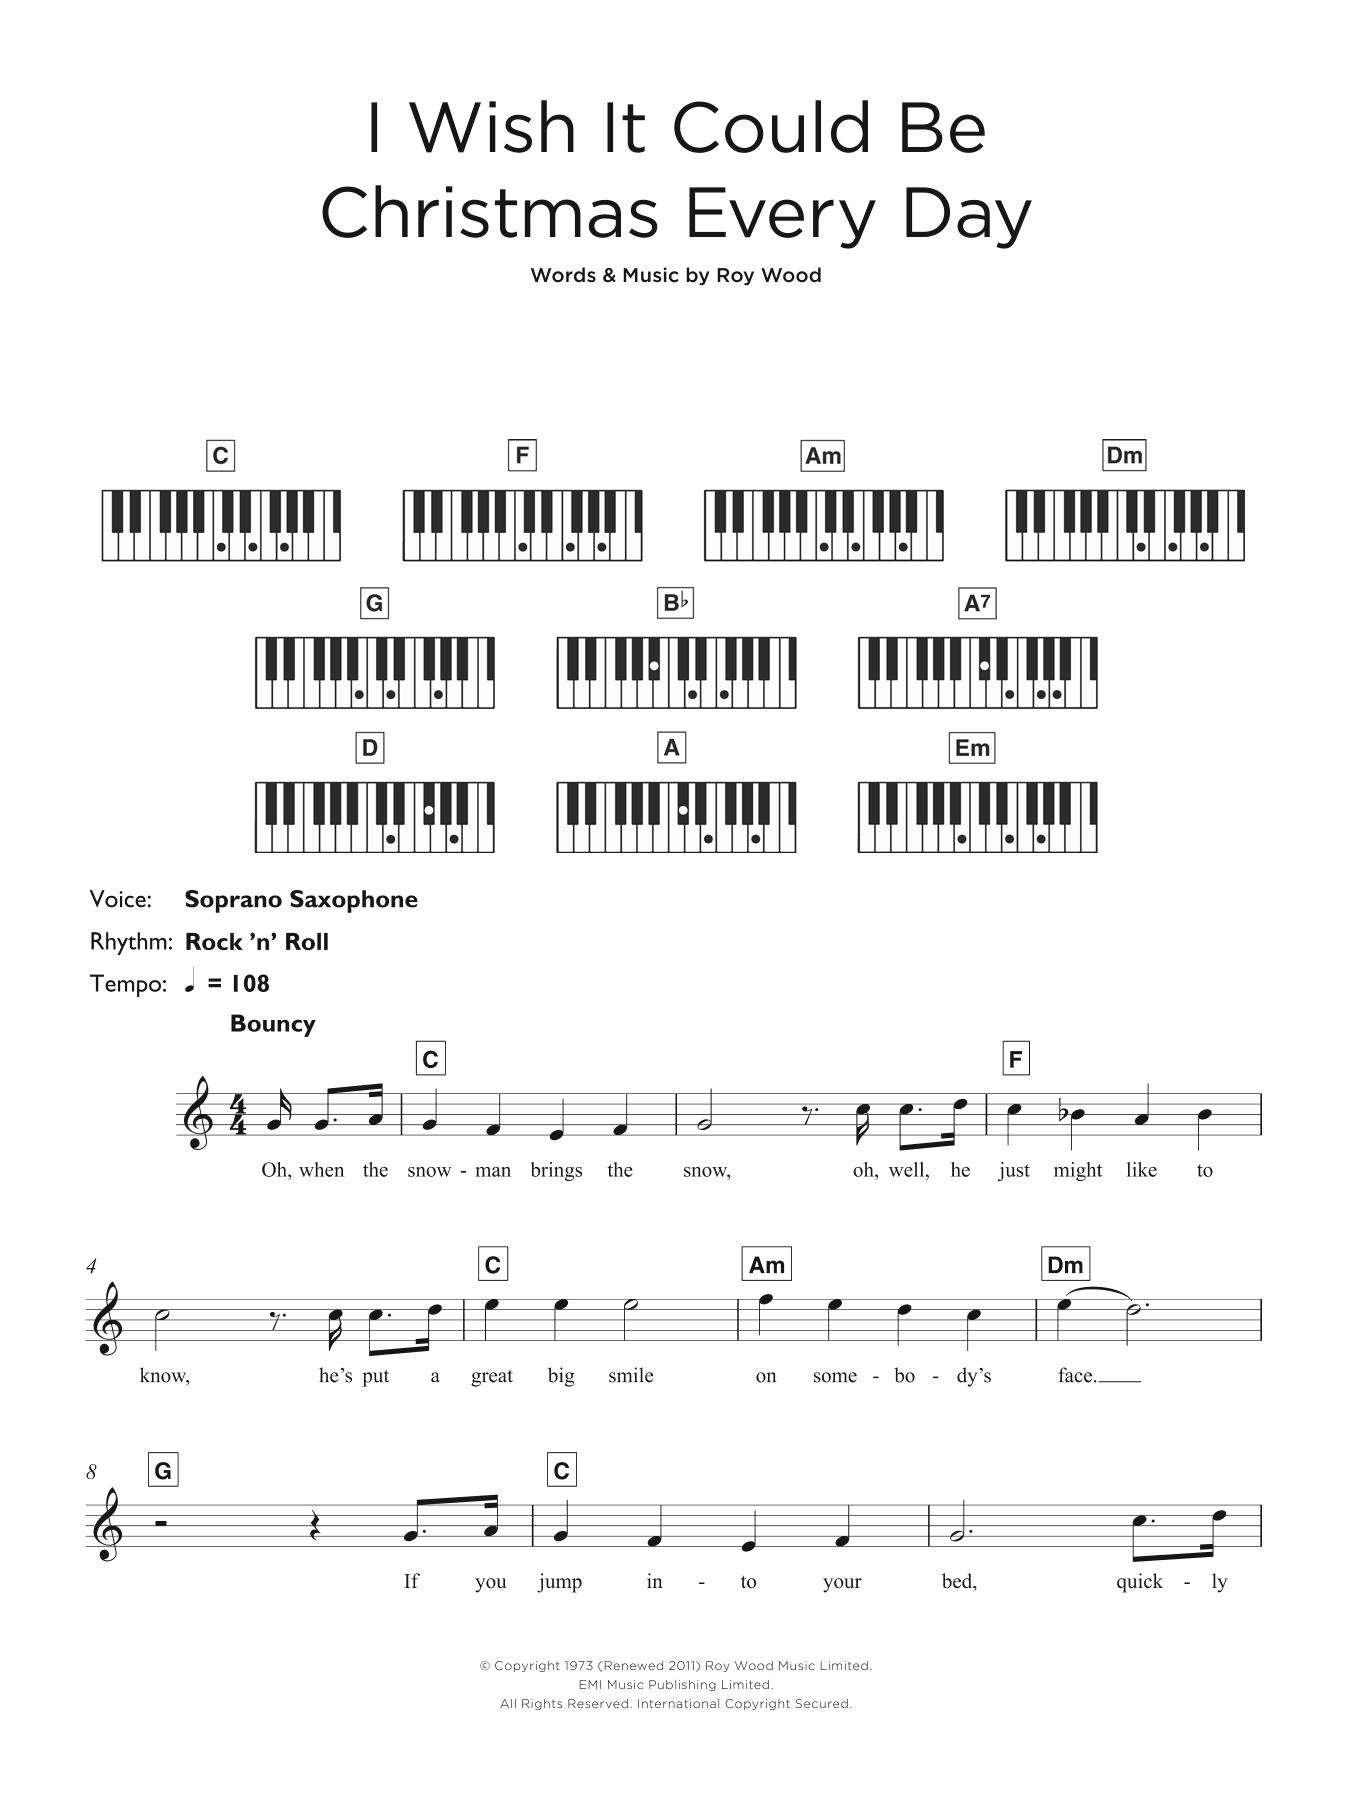 Sheet Music Digital Files To Print - Licensed Wizzard Digital Sheet ...